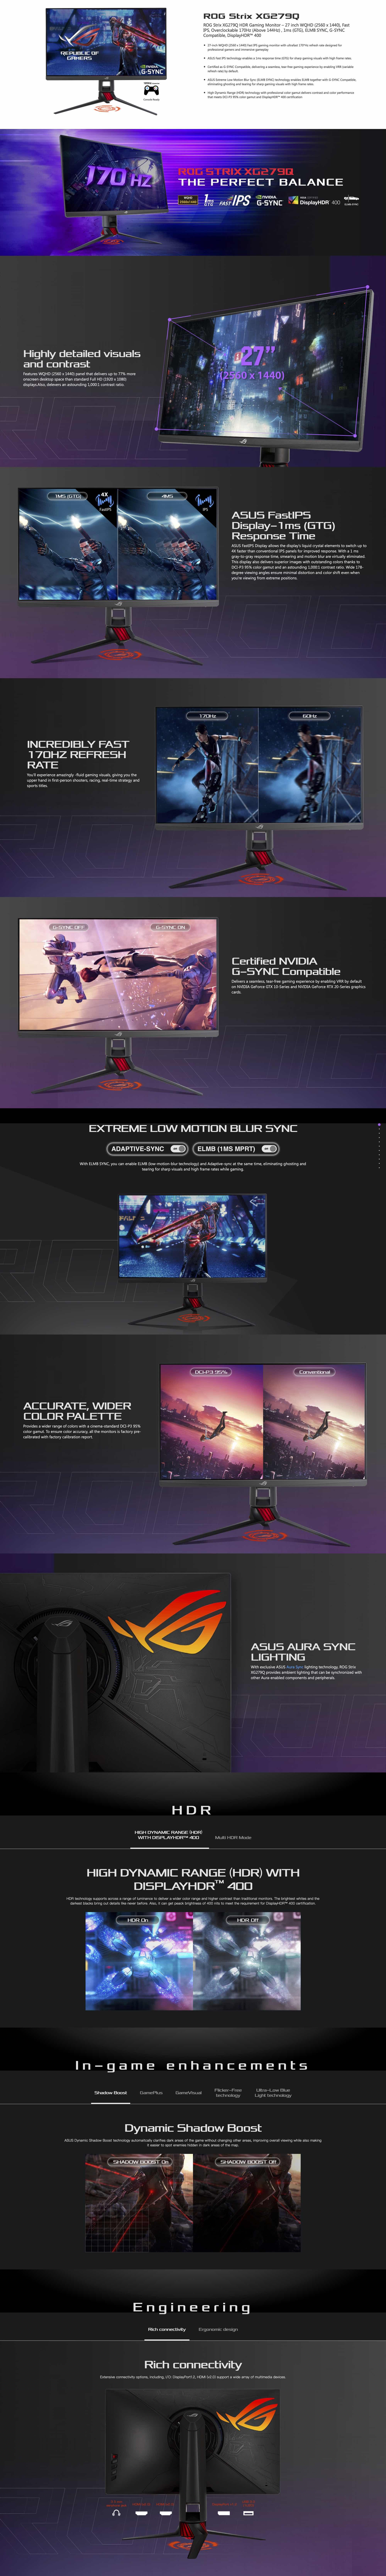 "Asus ROG Strix XG279Q | 27"" WQHD 170Hz (OC) 1ms HDR IPS G-Sync/ELMB-Sync Gaming Monitor description and specs"